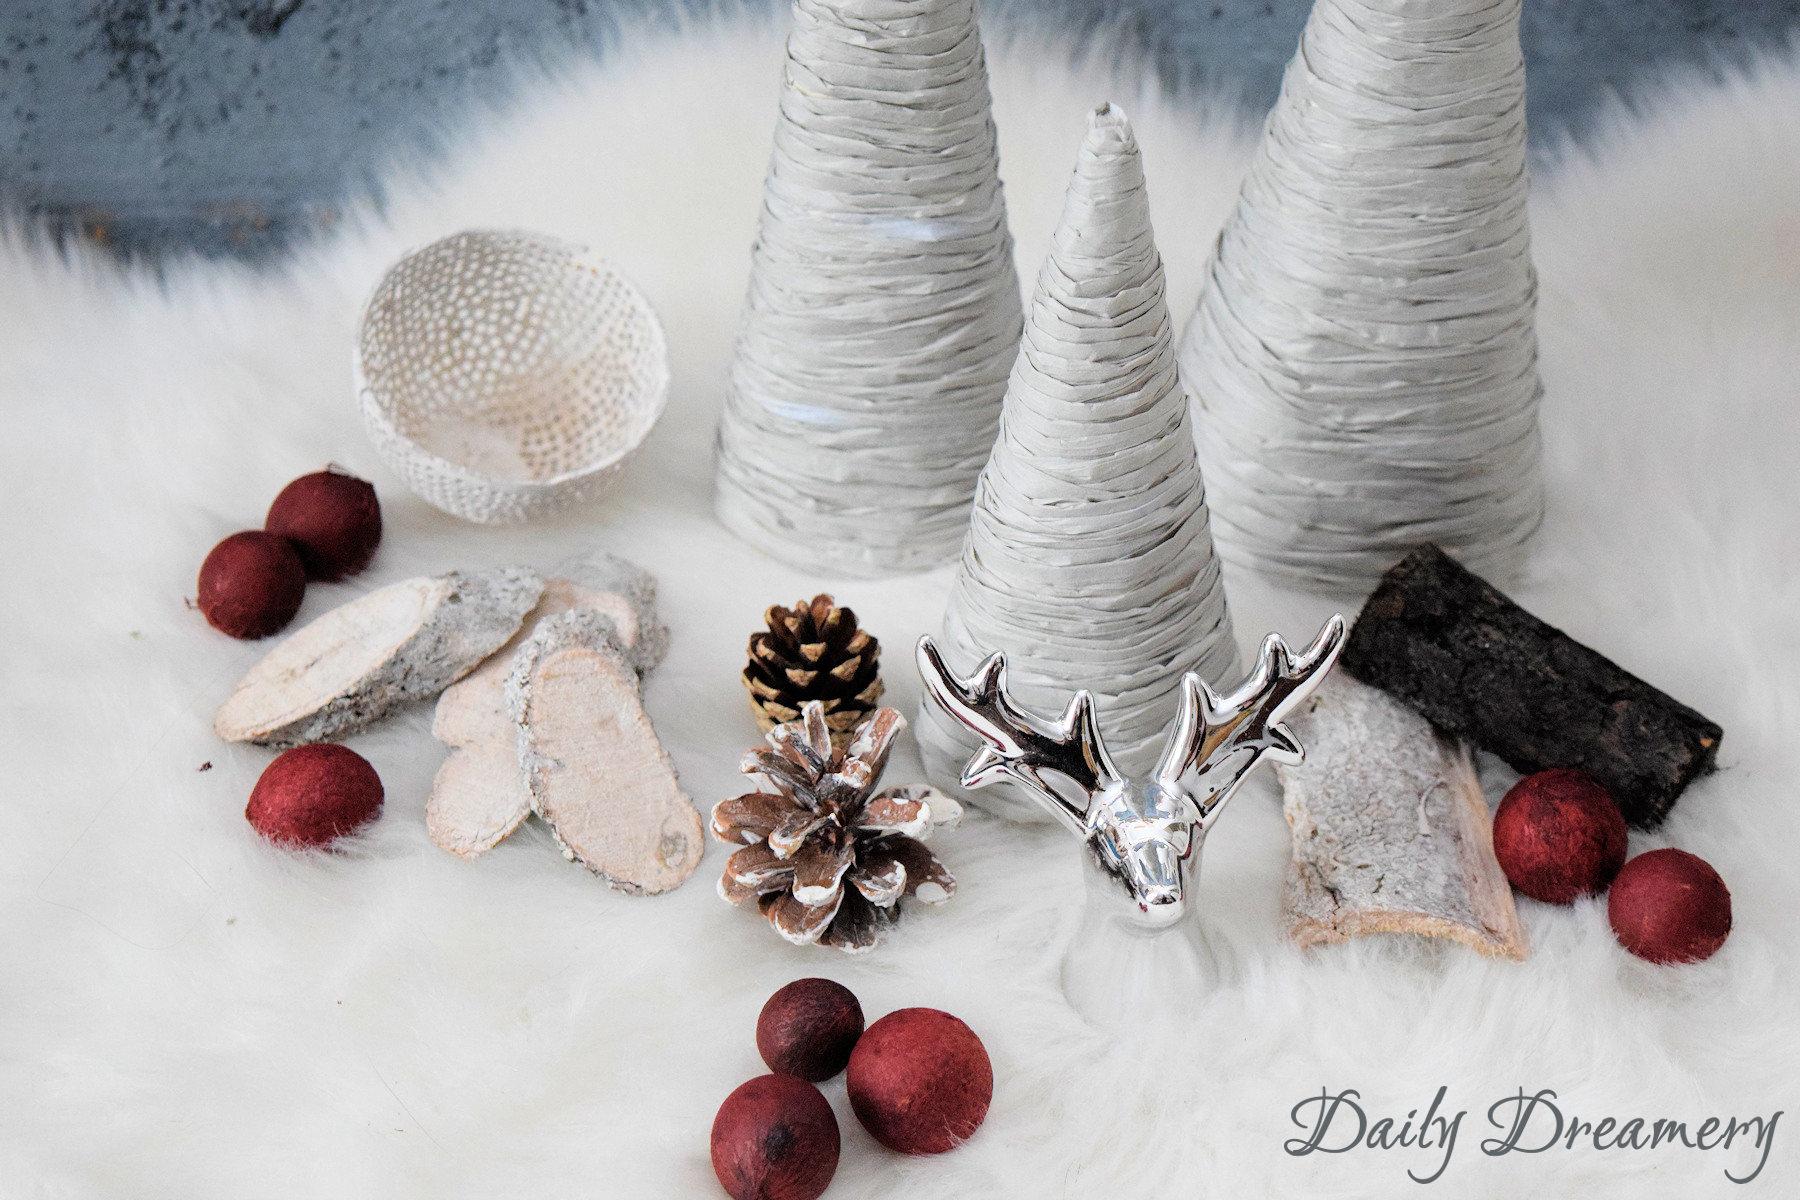 Diy Weihnachtsdeko.Diy Weihnachtsdeko Weihnachtsbaum Papiergarn 6 Daily Dreamery